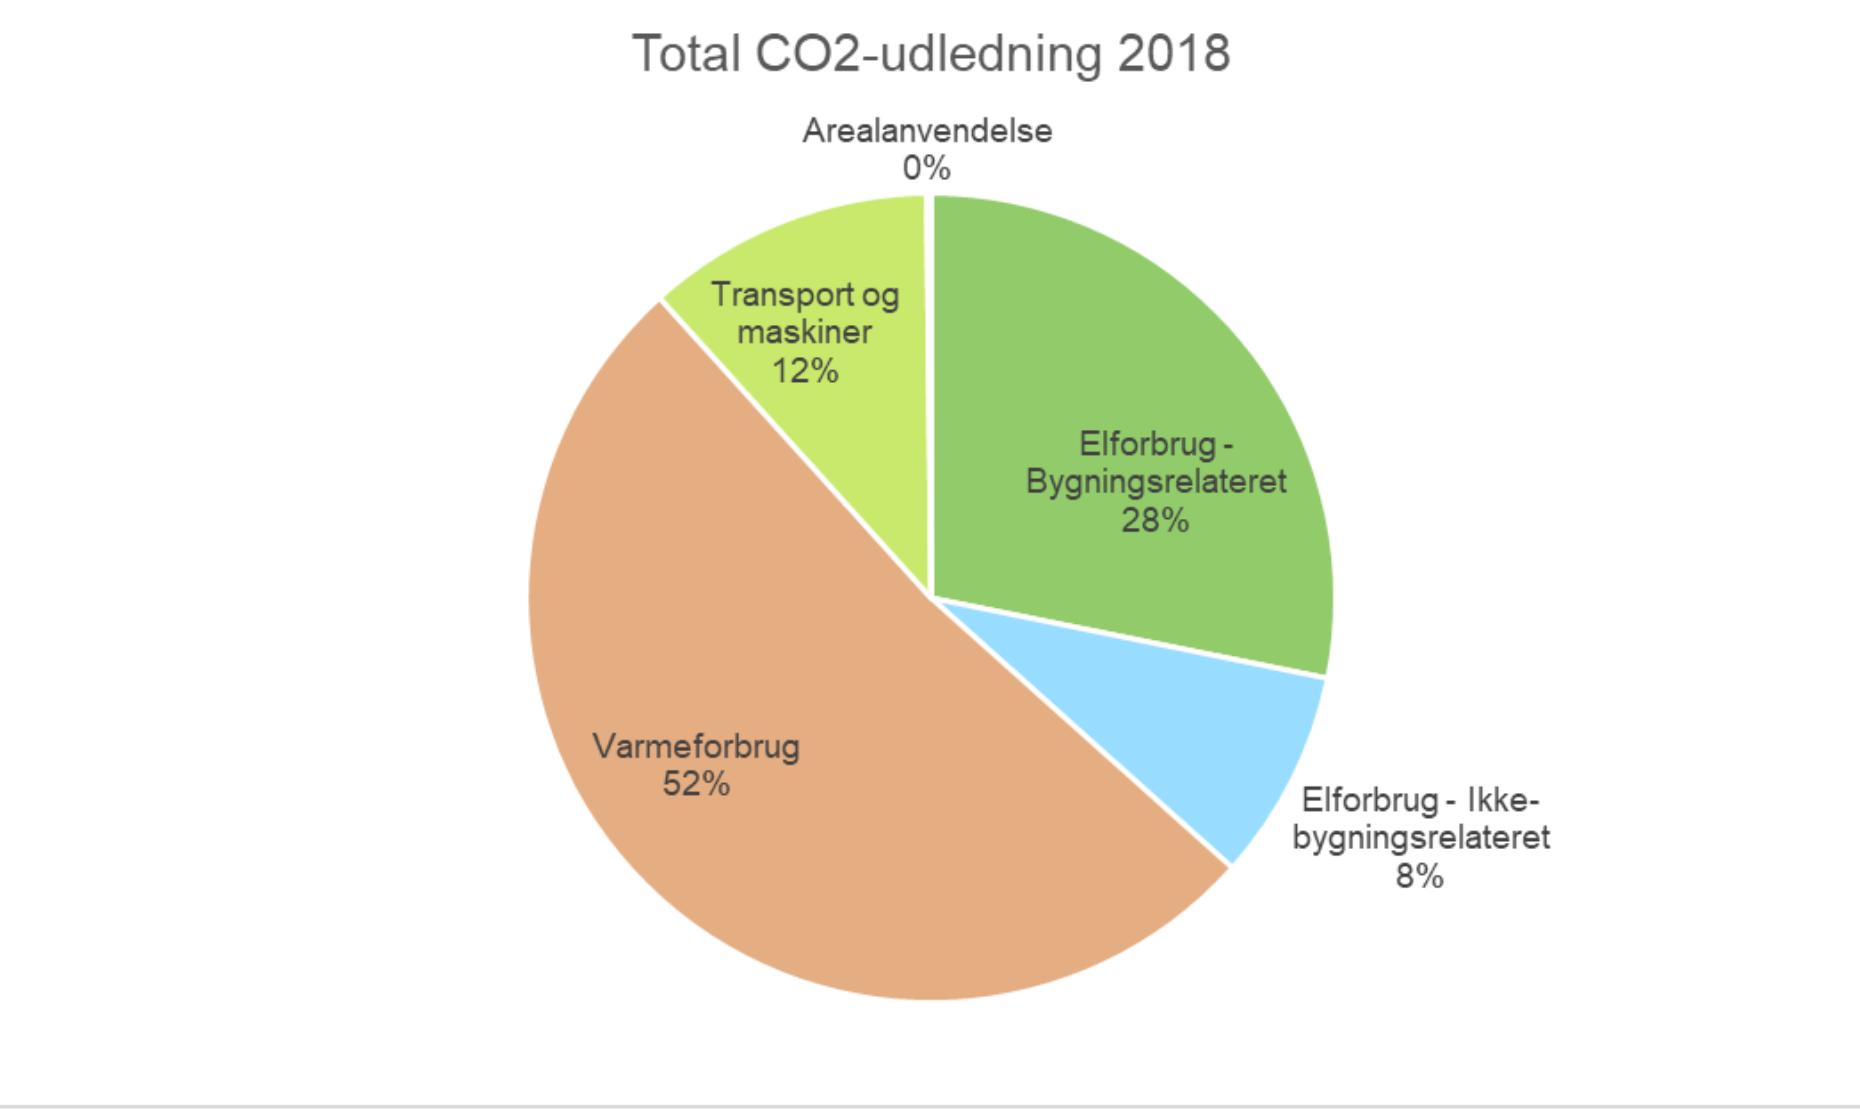 CO2-regnskab klima viegand maagøe